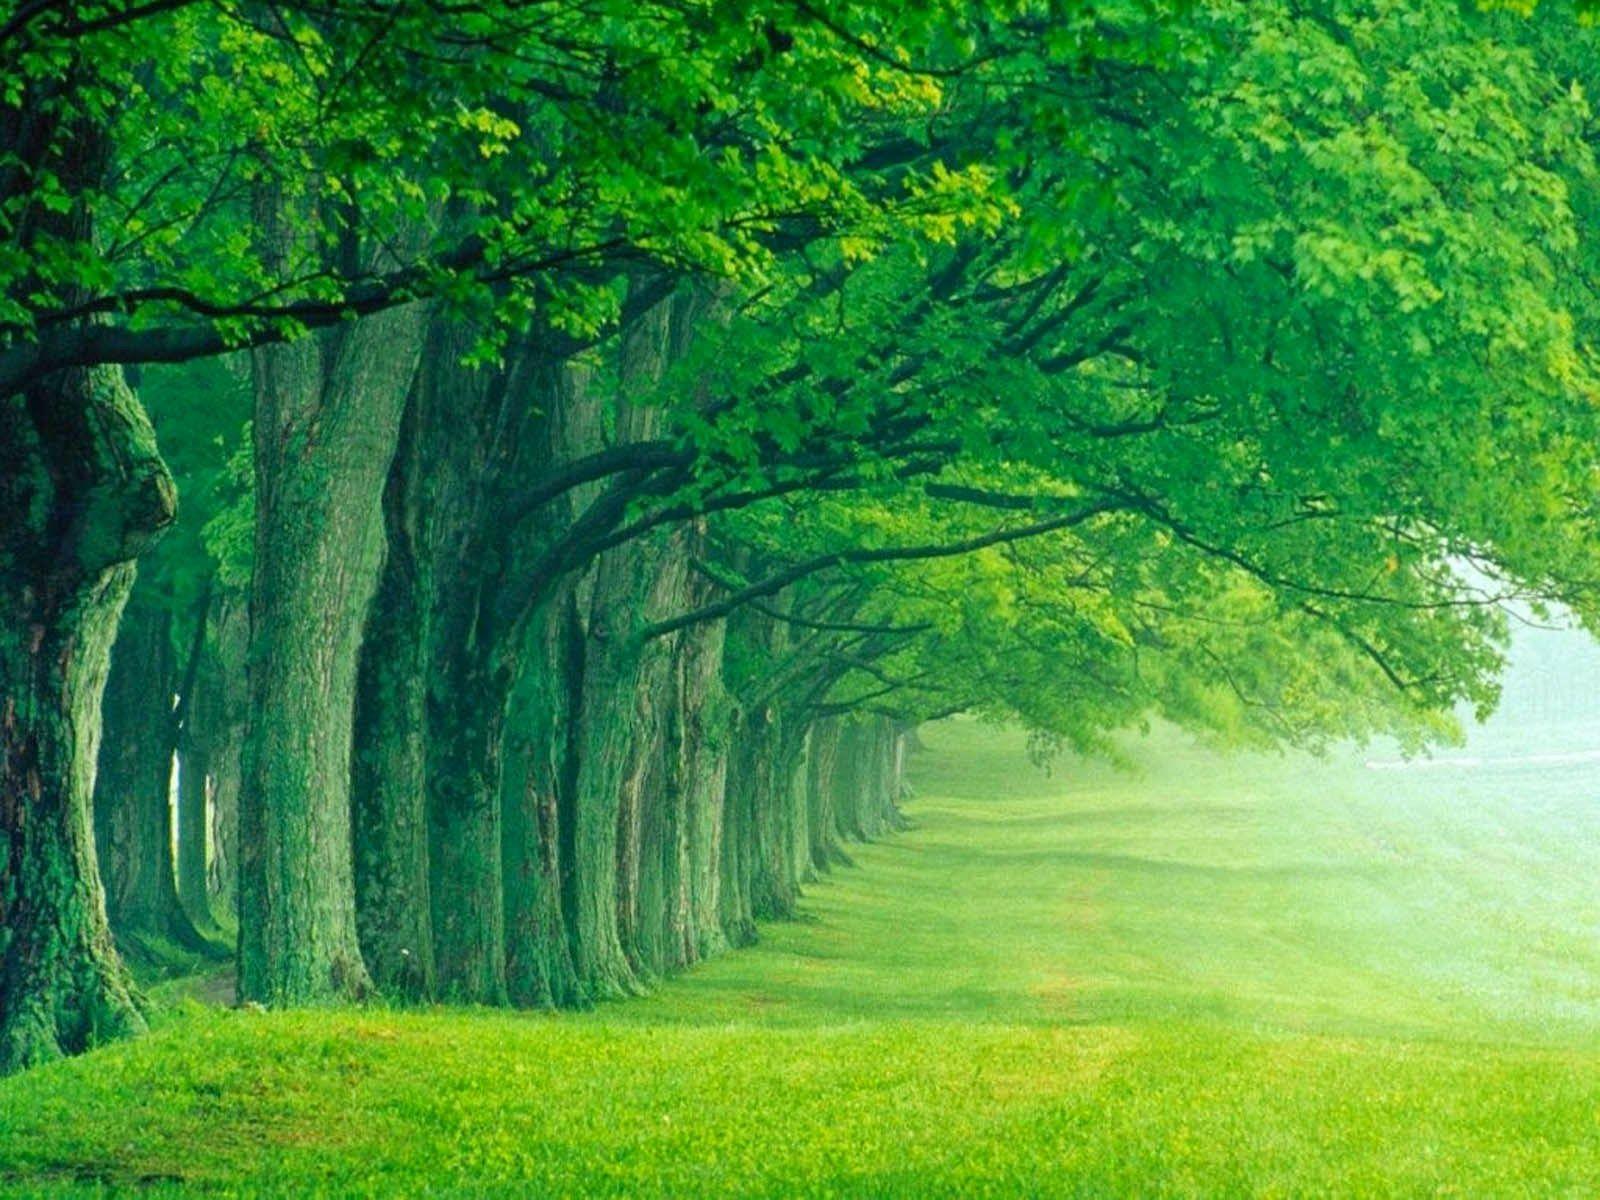 Greenish Nature Beautiful Nature Beautiful Nature Wallpaper Green Nature